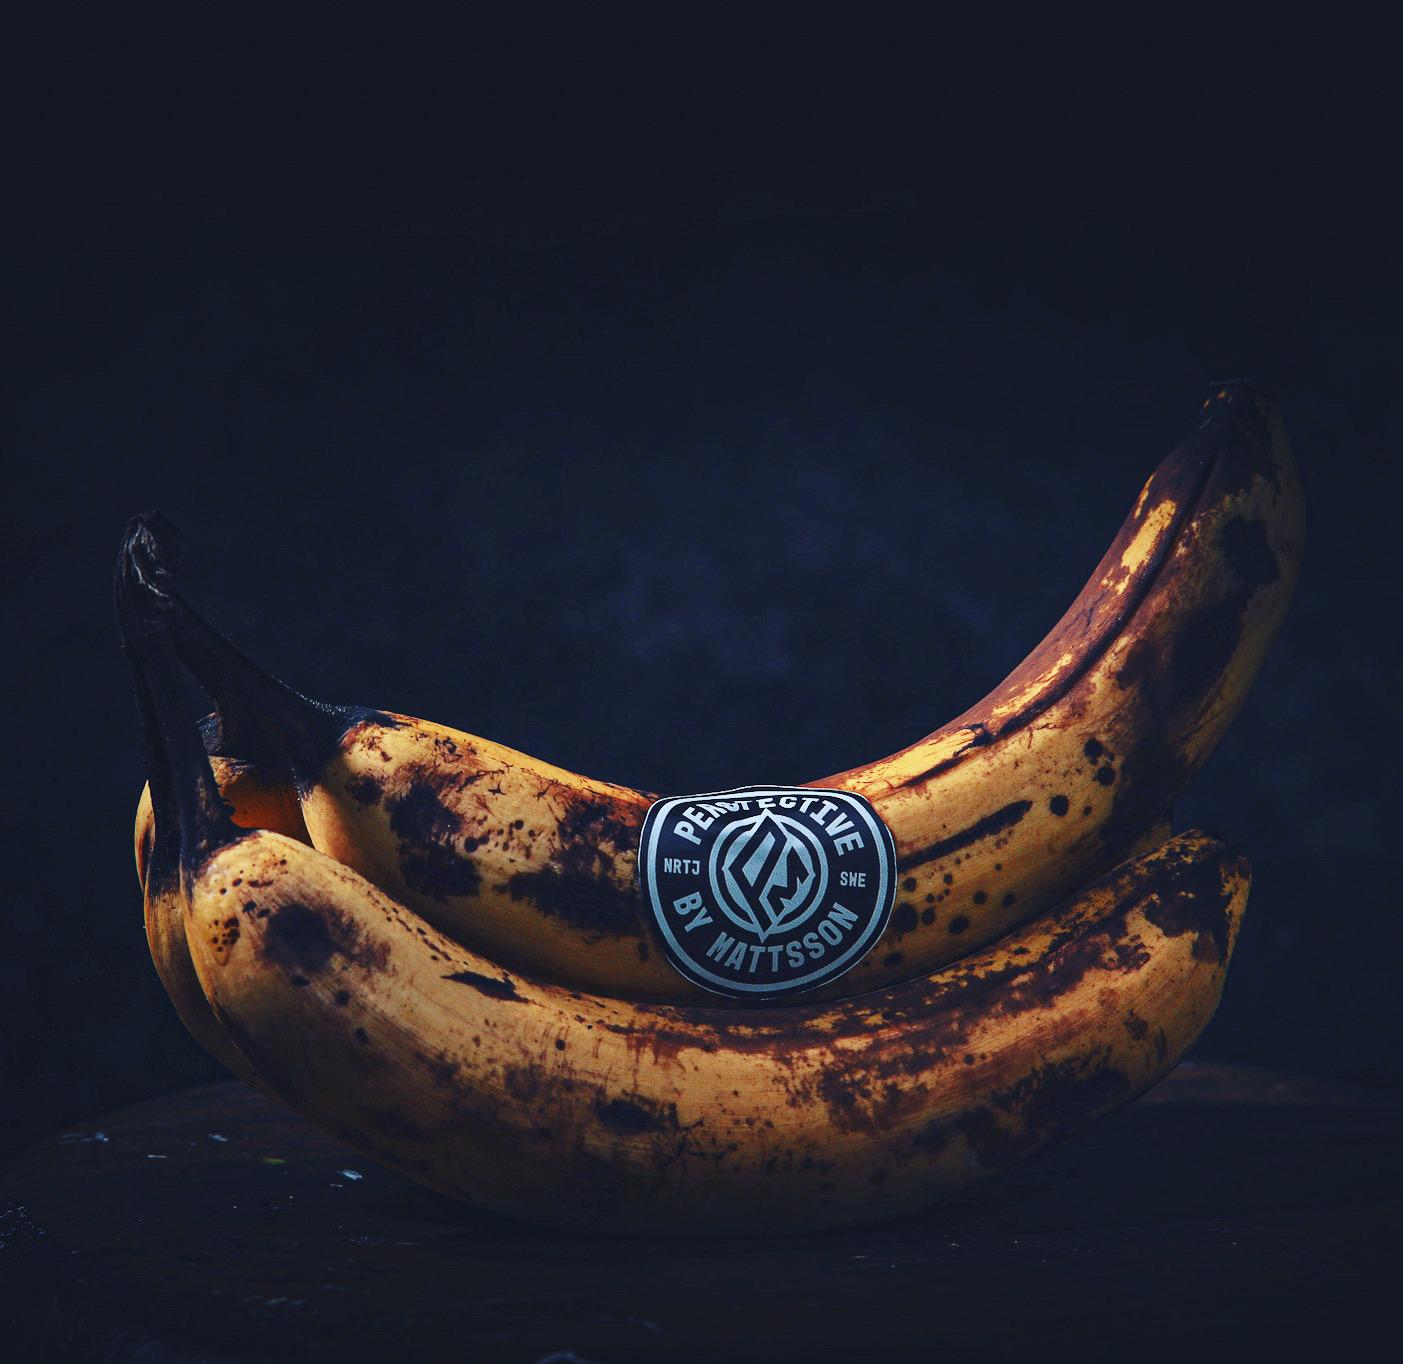 mogna bananer med perspective by Mattsson logga